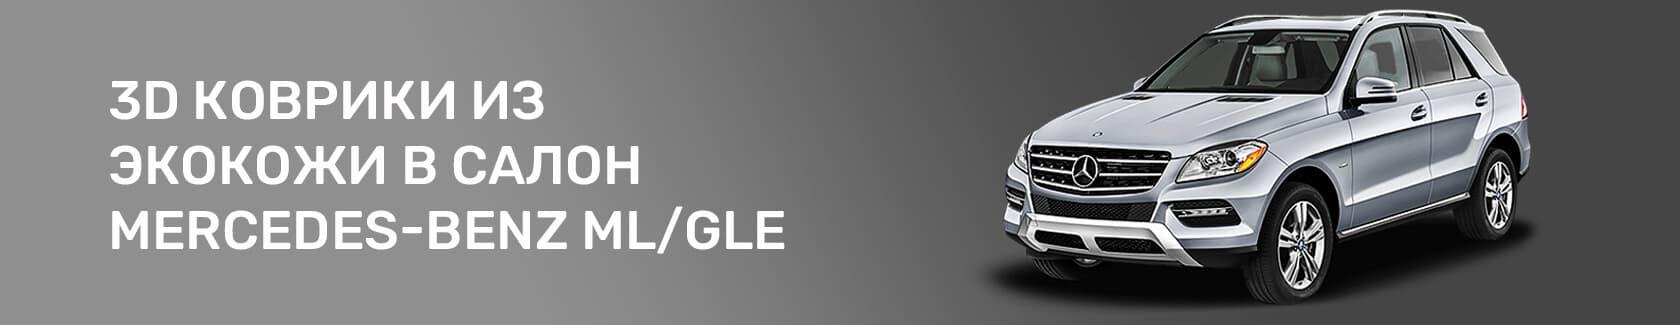 3D-коврики из экокожи для Mercedes-Benz ML/GLE